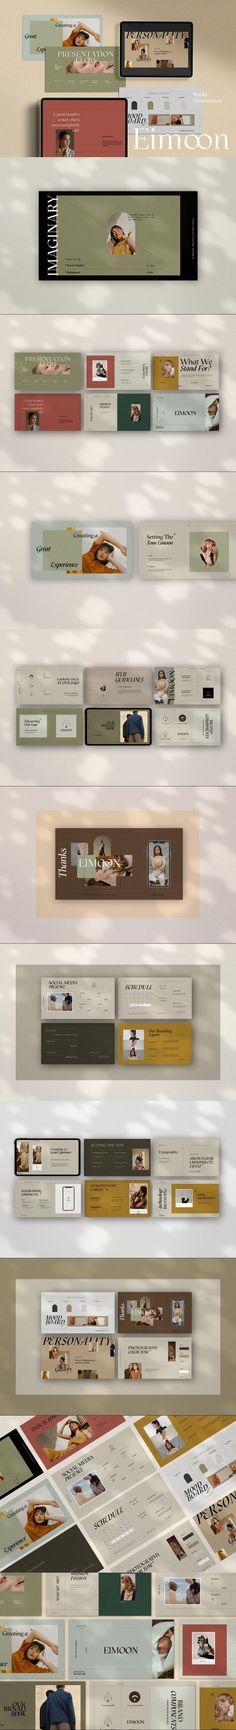 Eimoon Brand Powerpoint #ecomerce #presentation #presentation #process #pptkeynote #aschavinsco #agency #ppt #intention #welcomekit #mediainstagram #powerpoint #powerpointforbusiness #brandmanual #layout #book #themesforpowerpoint #minimalism #companybranding Presentation Design, Presentation Templates, Brand Manual, Keynote, Minimalism, Photoshop, Layout, Proposal, Letters